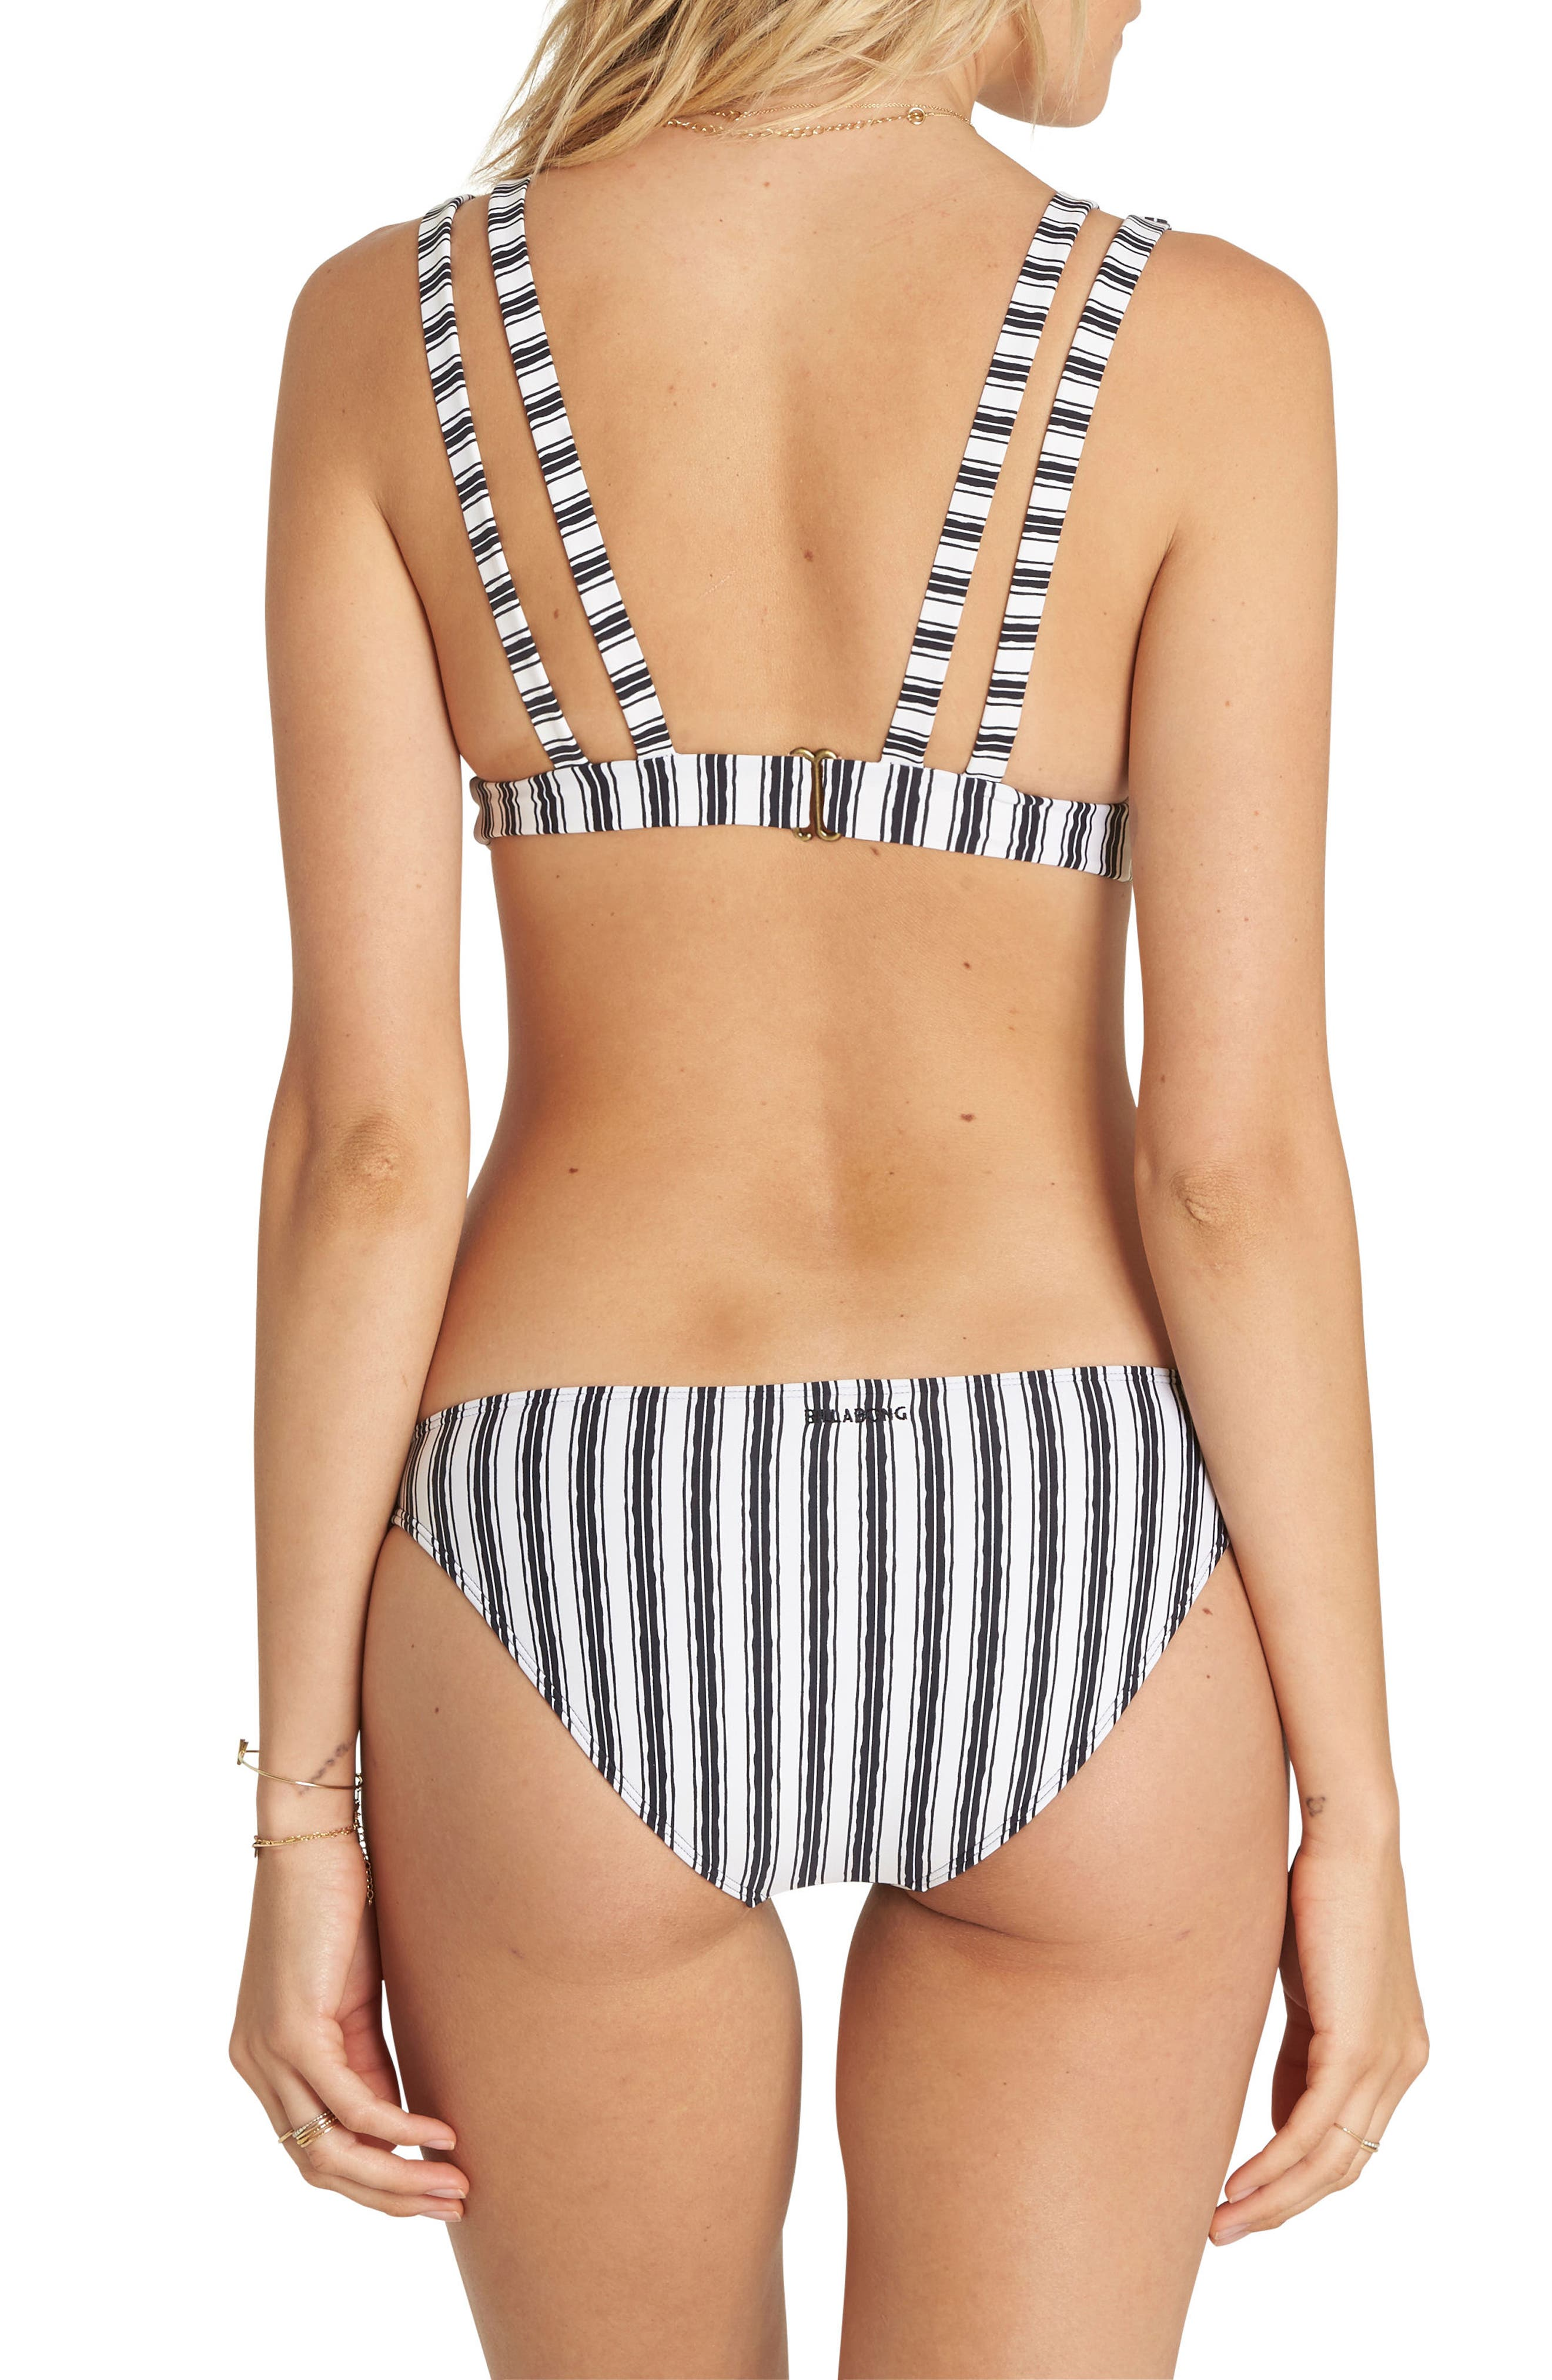 Get in Line Lowrider Bikini Bottoms,                             Alternate thumbnail 4, color,